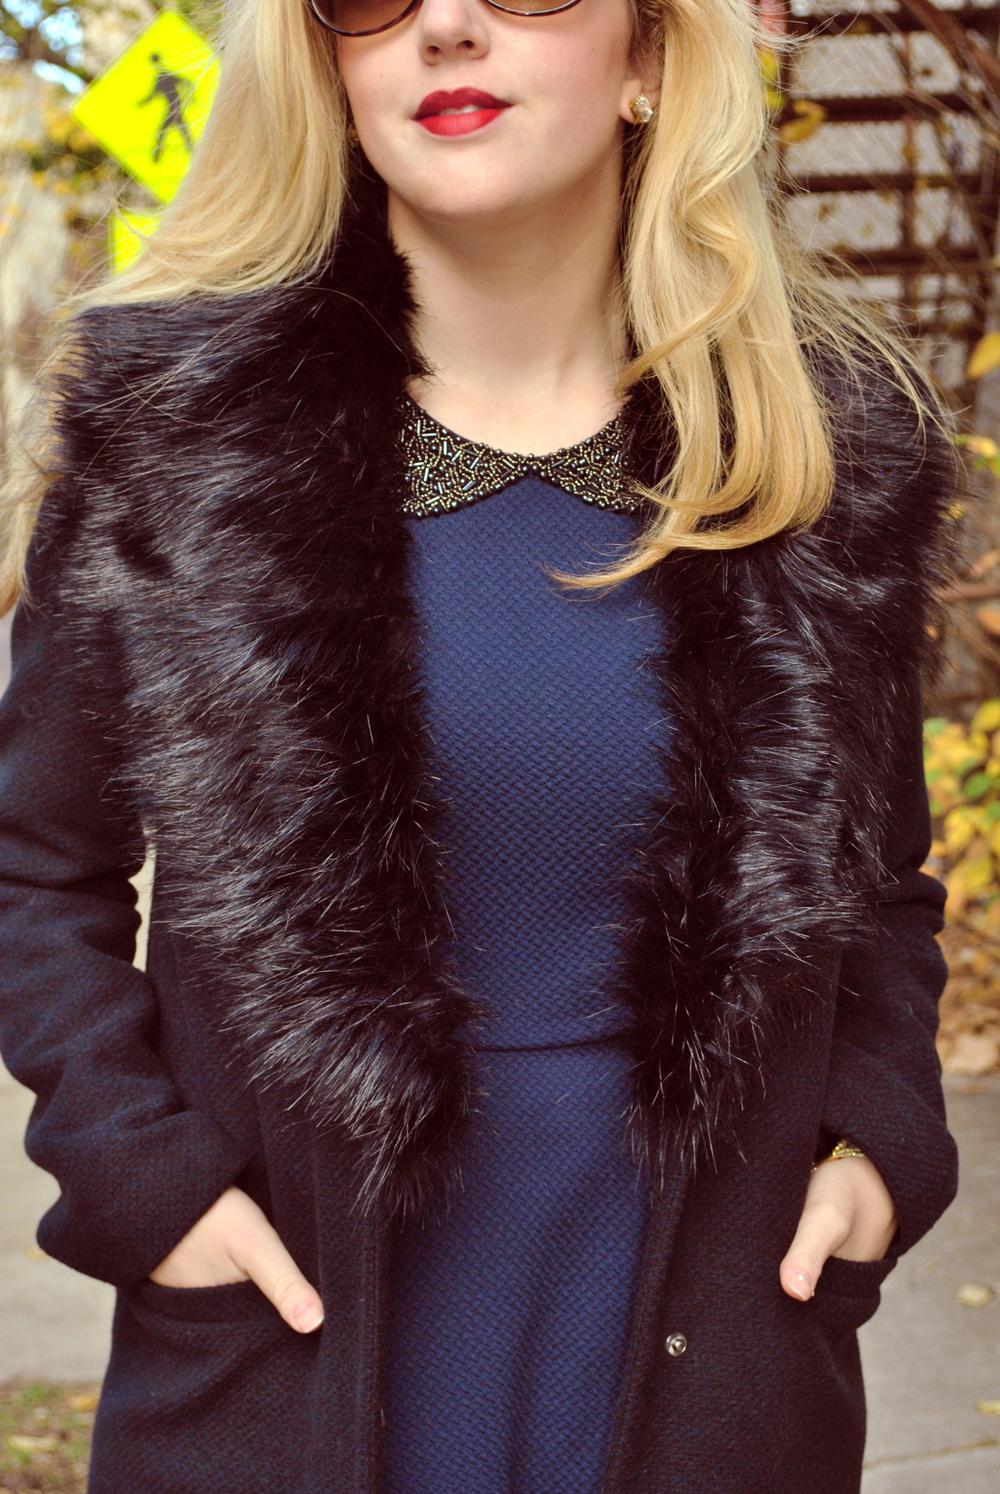 thoughtfulwish | preppy outfit // boston fashion // new england fashion // preppy // faux fur // navy dress // kate spade // primark boston // scream queens fashion